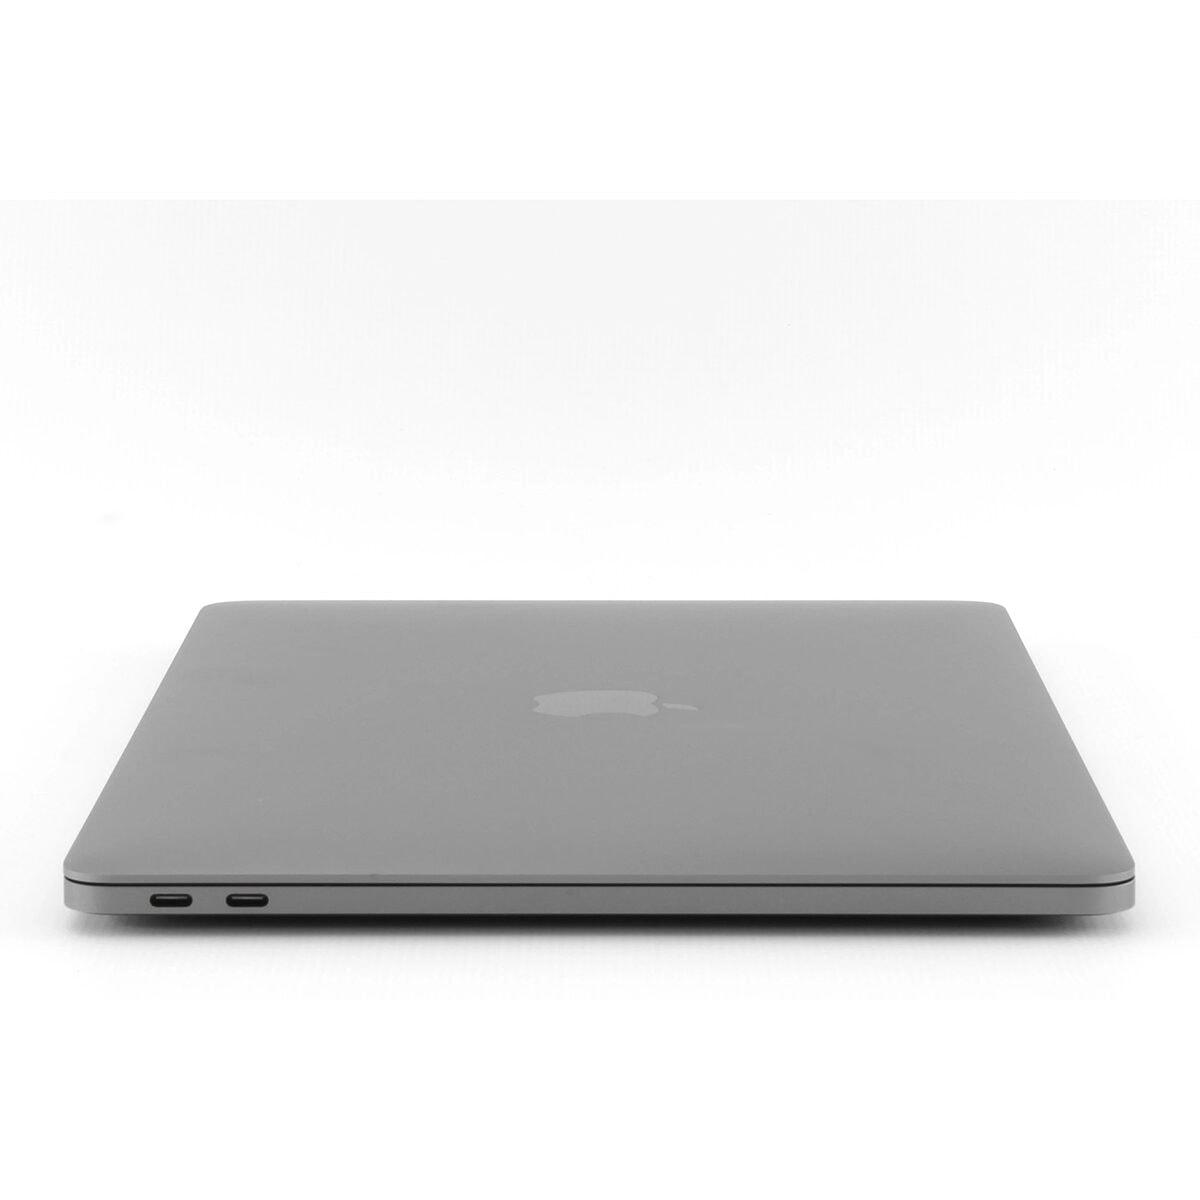 "Retina Apple Macbook Pro 13.3"" 2017 128GB SSD 8GB RAM Powerful Core i5 Mac Laptop OS Catalina Space Grey"